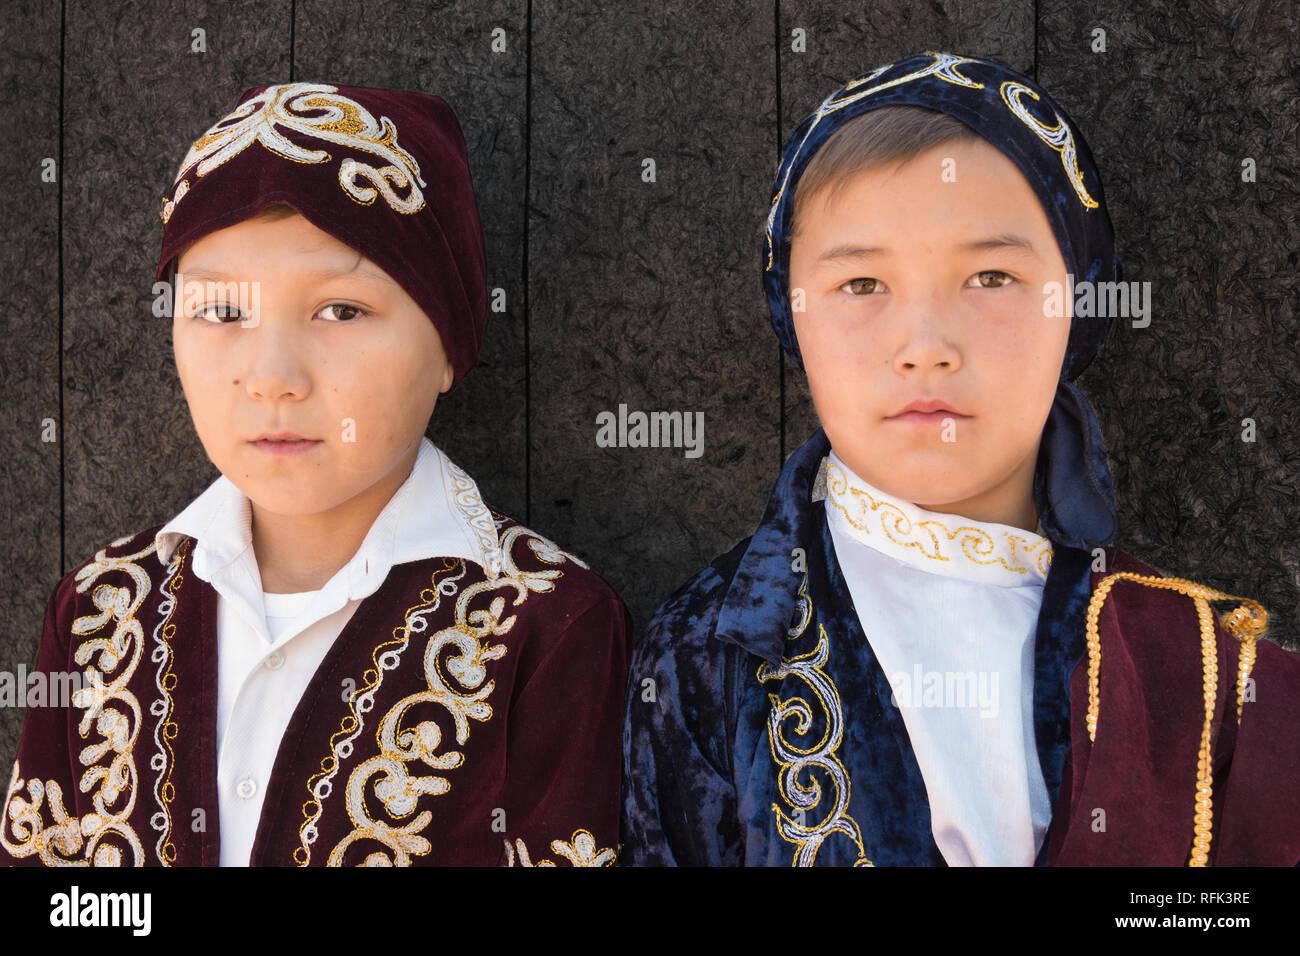 Pair of Kazakh boys, Almaty, Kazakhstan - Stock Image